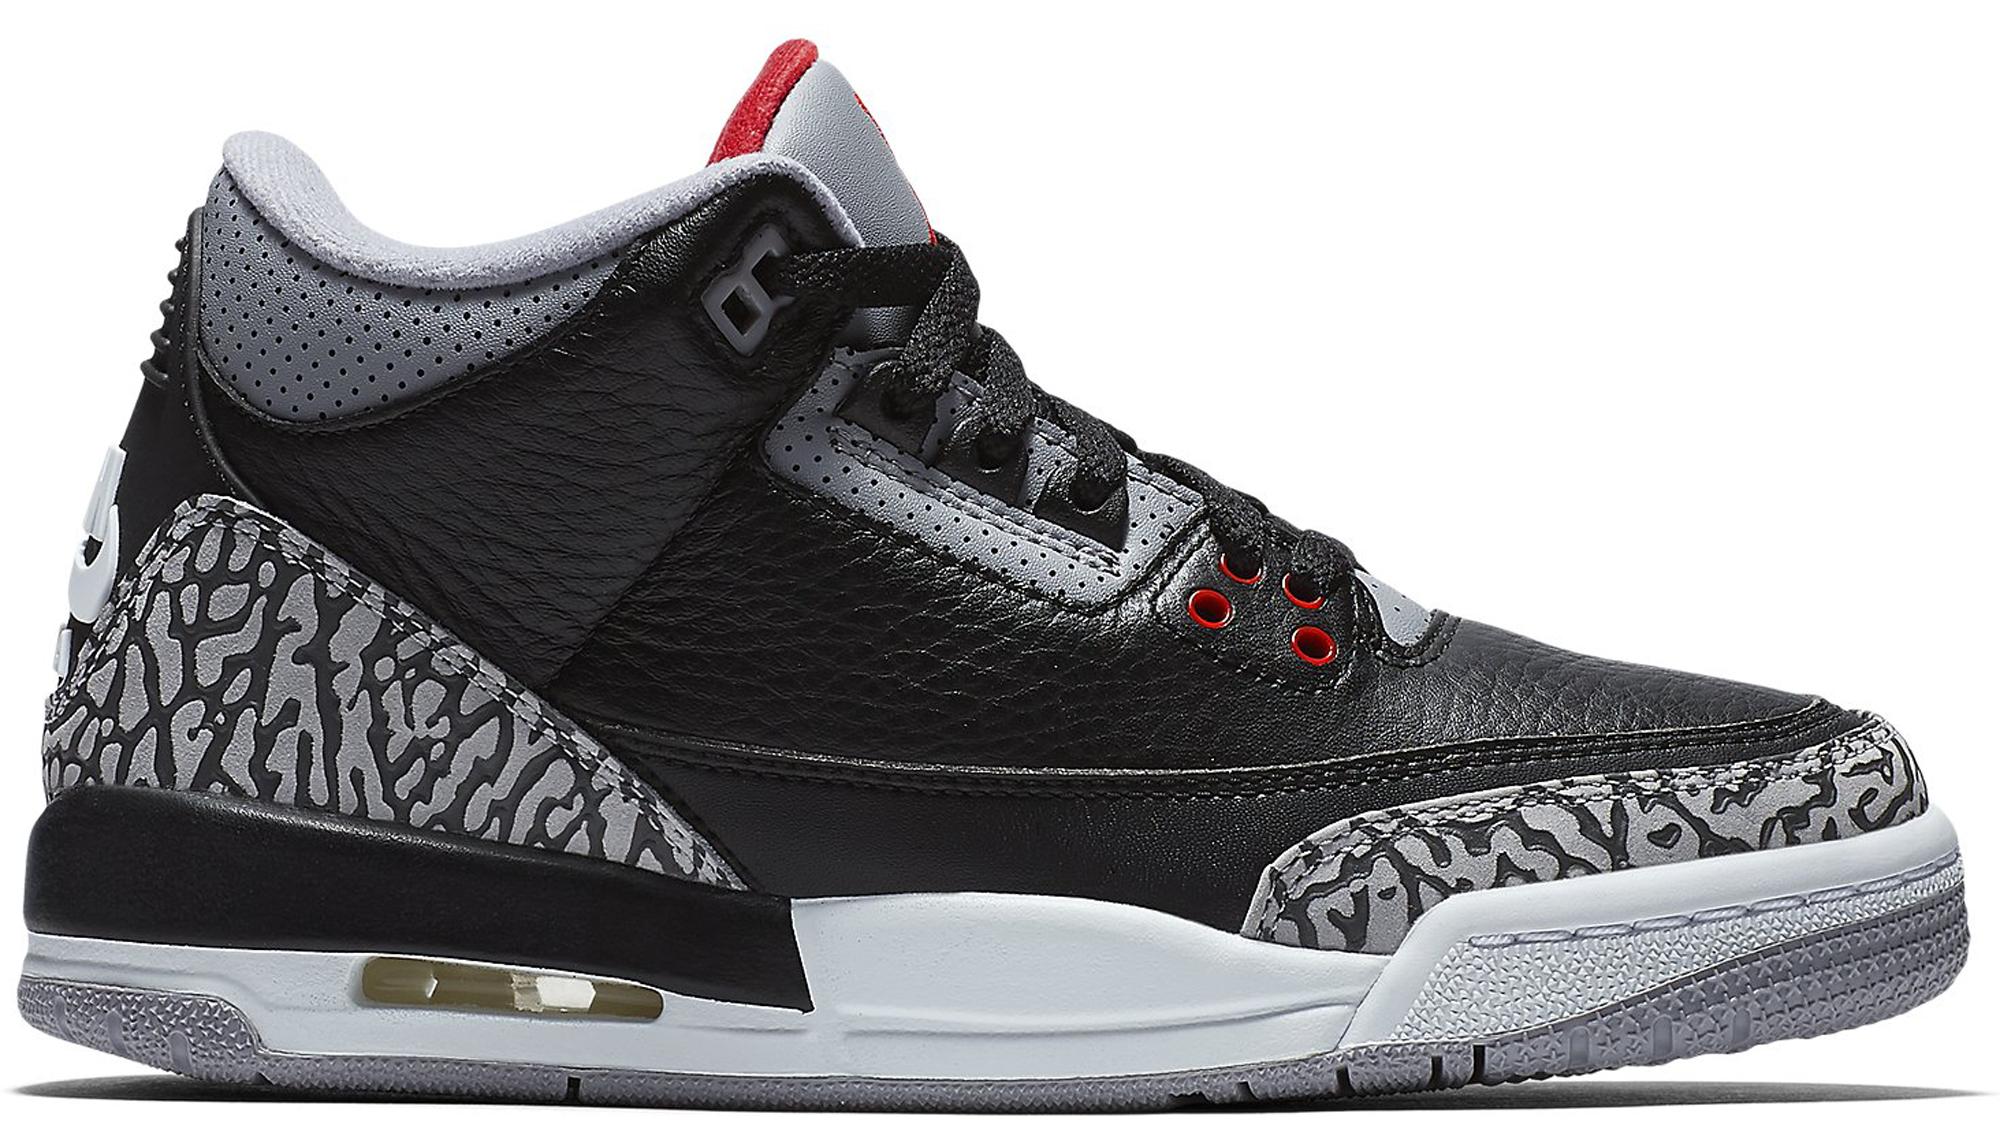 huge discount cc256 f2592 air jordan retro 3 shoes in black cement Nike ...